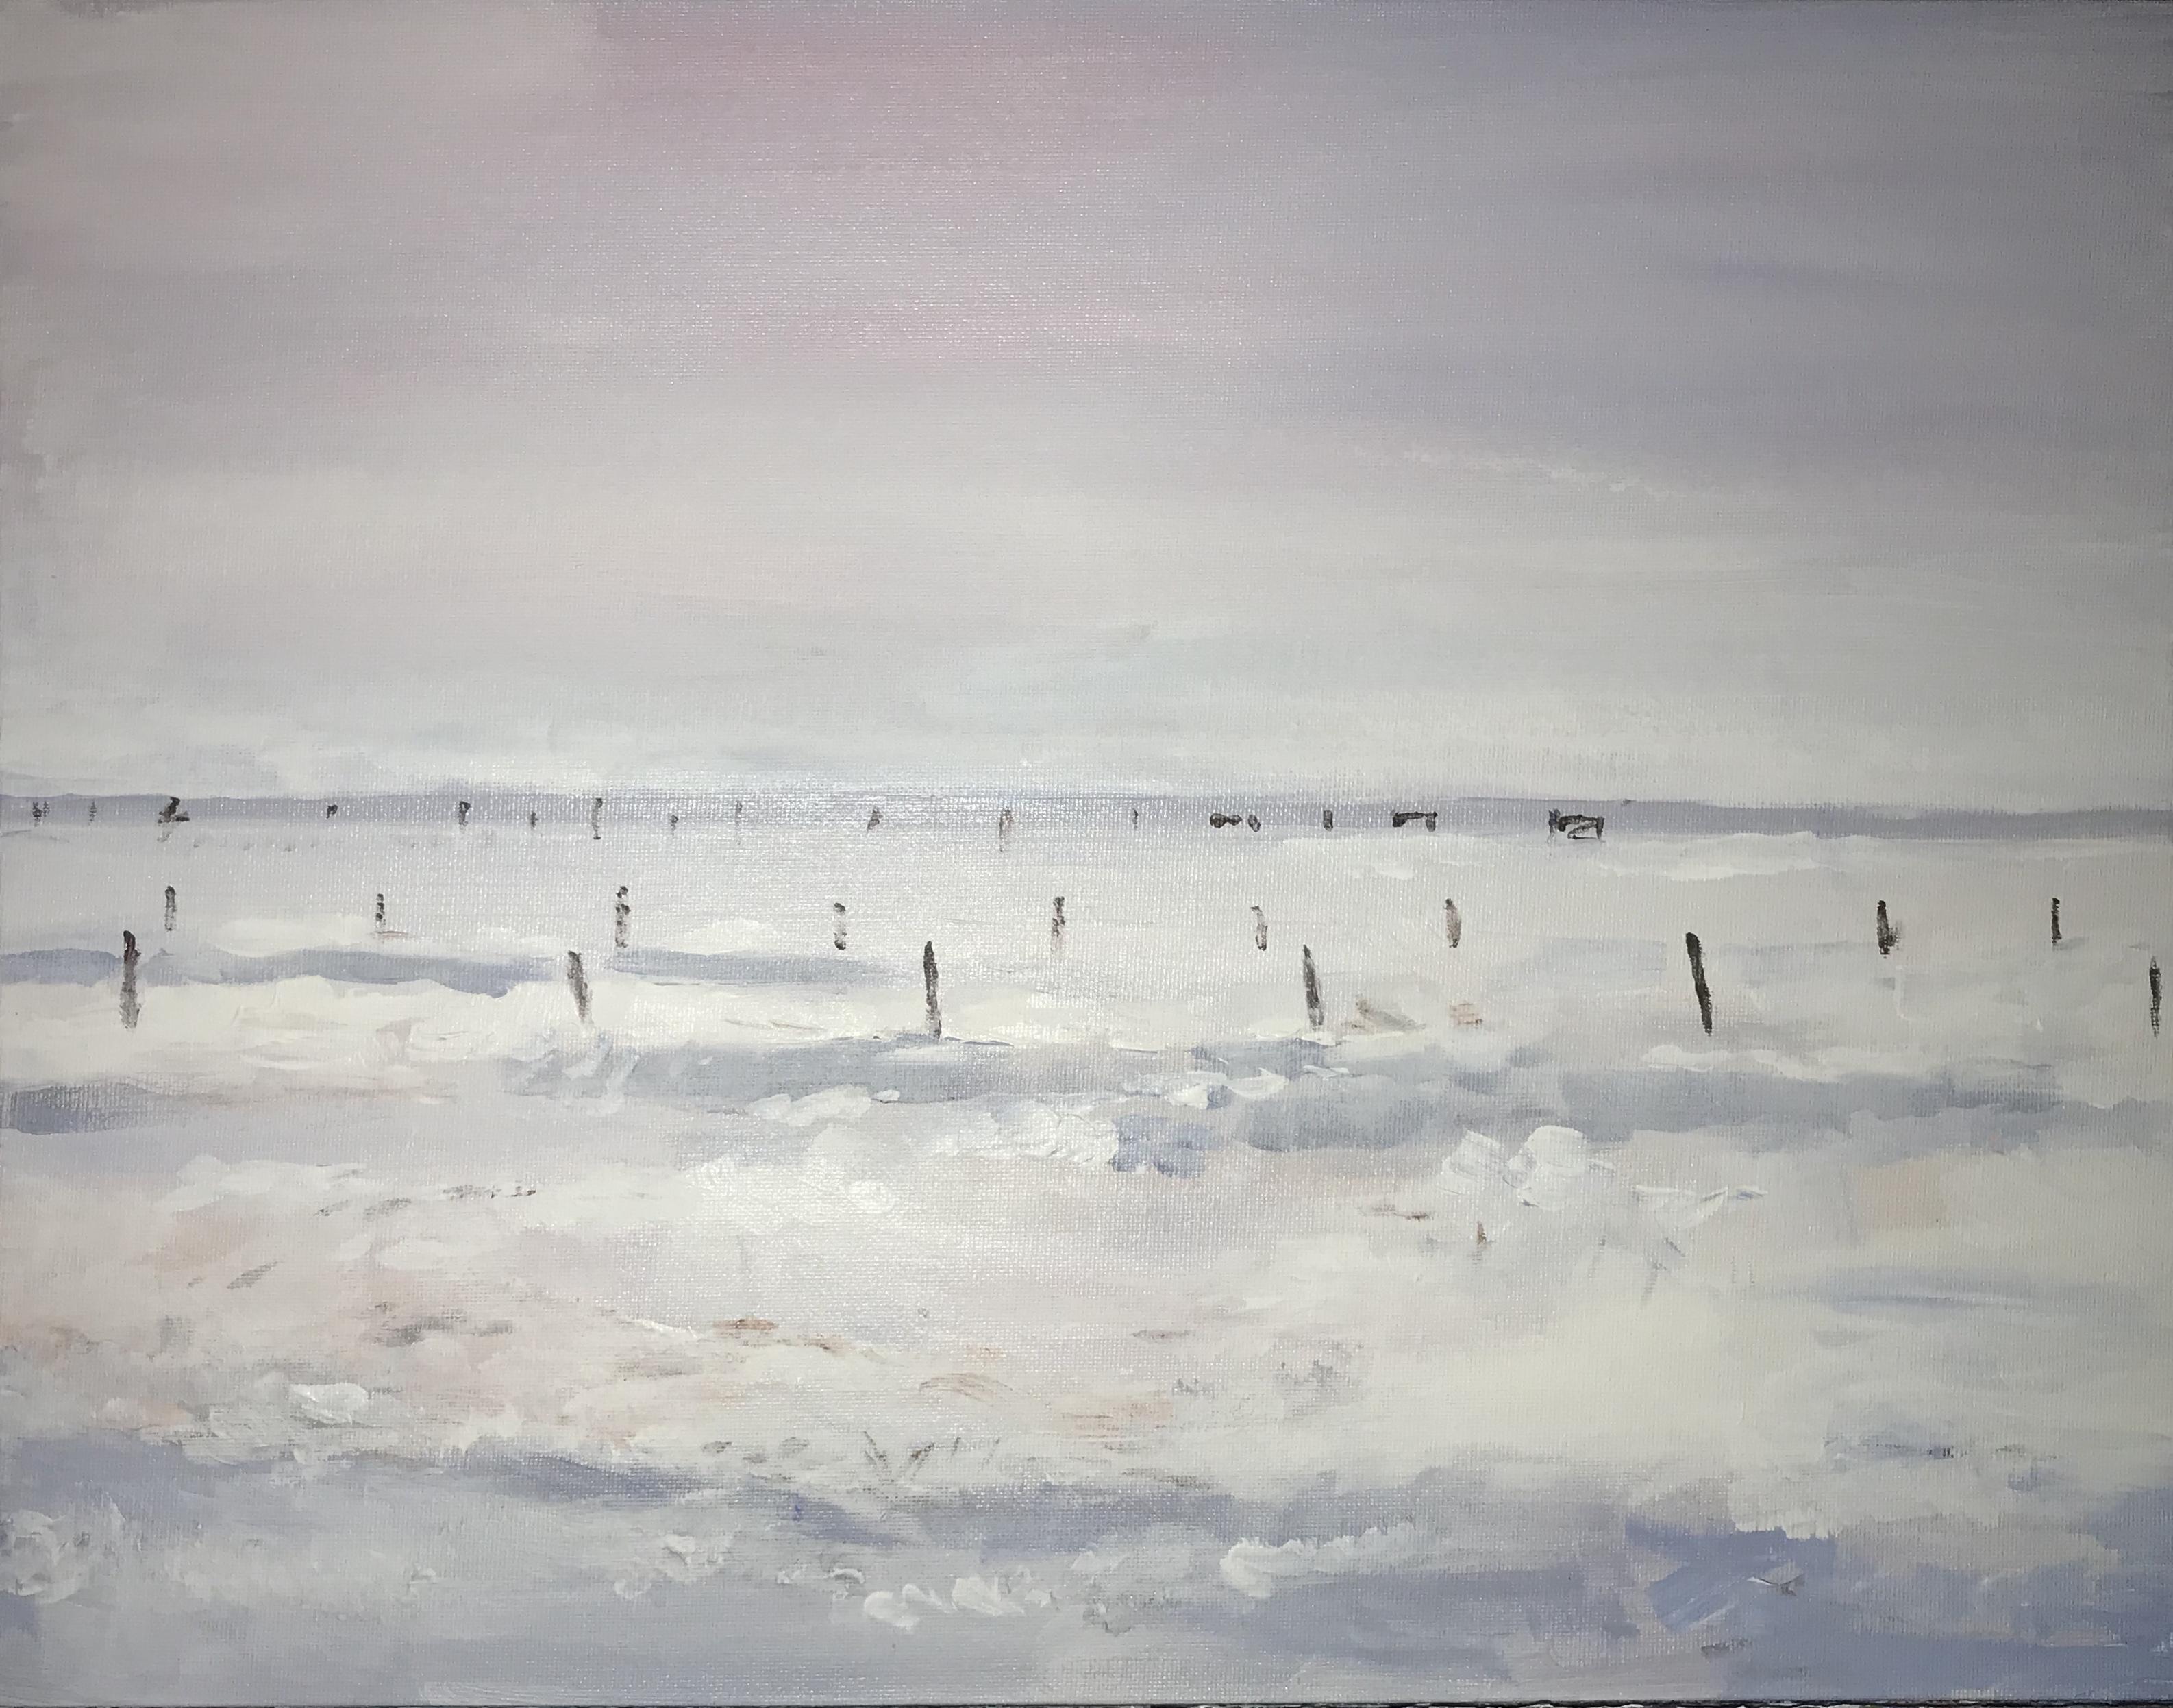 Fields of snow, Brent Jones, painting, Monet, denver, denver Art, Monet denver, impressionistic, impressionist Art, Colorado Art, Art, acrylic art